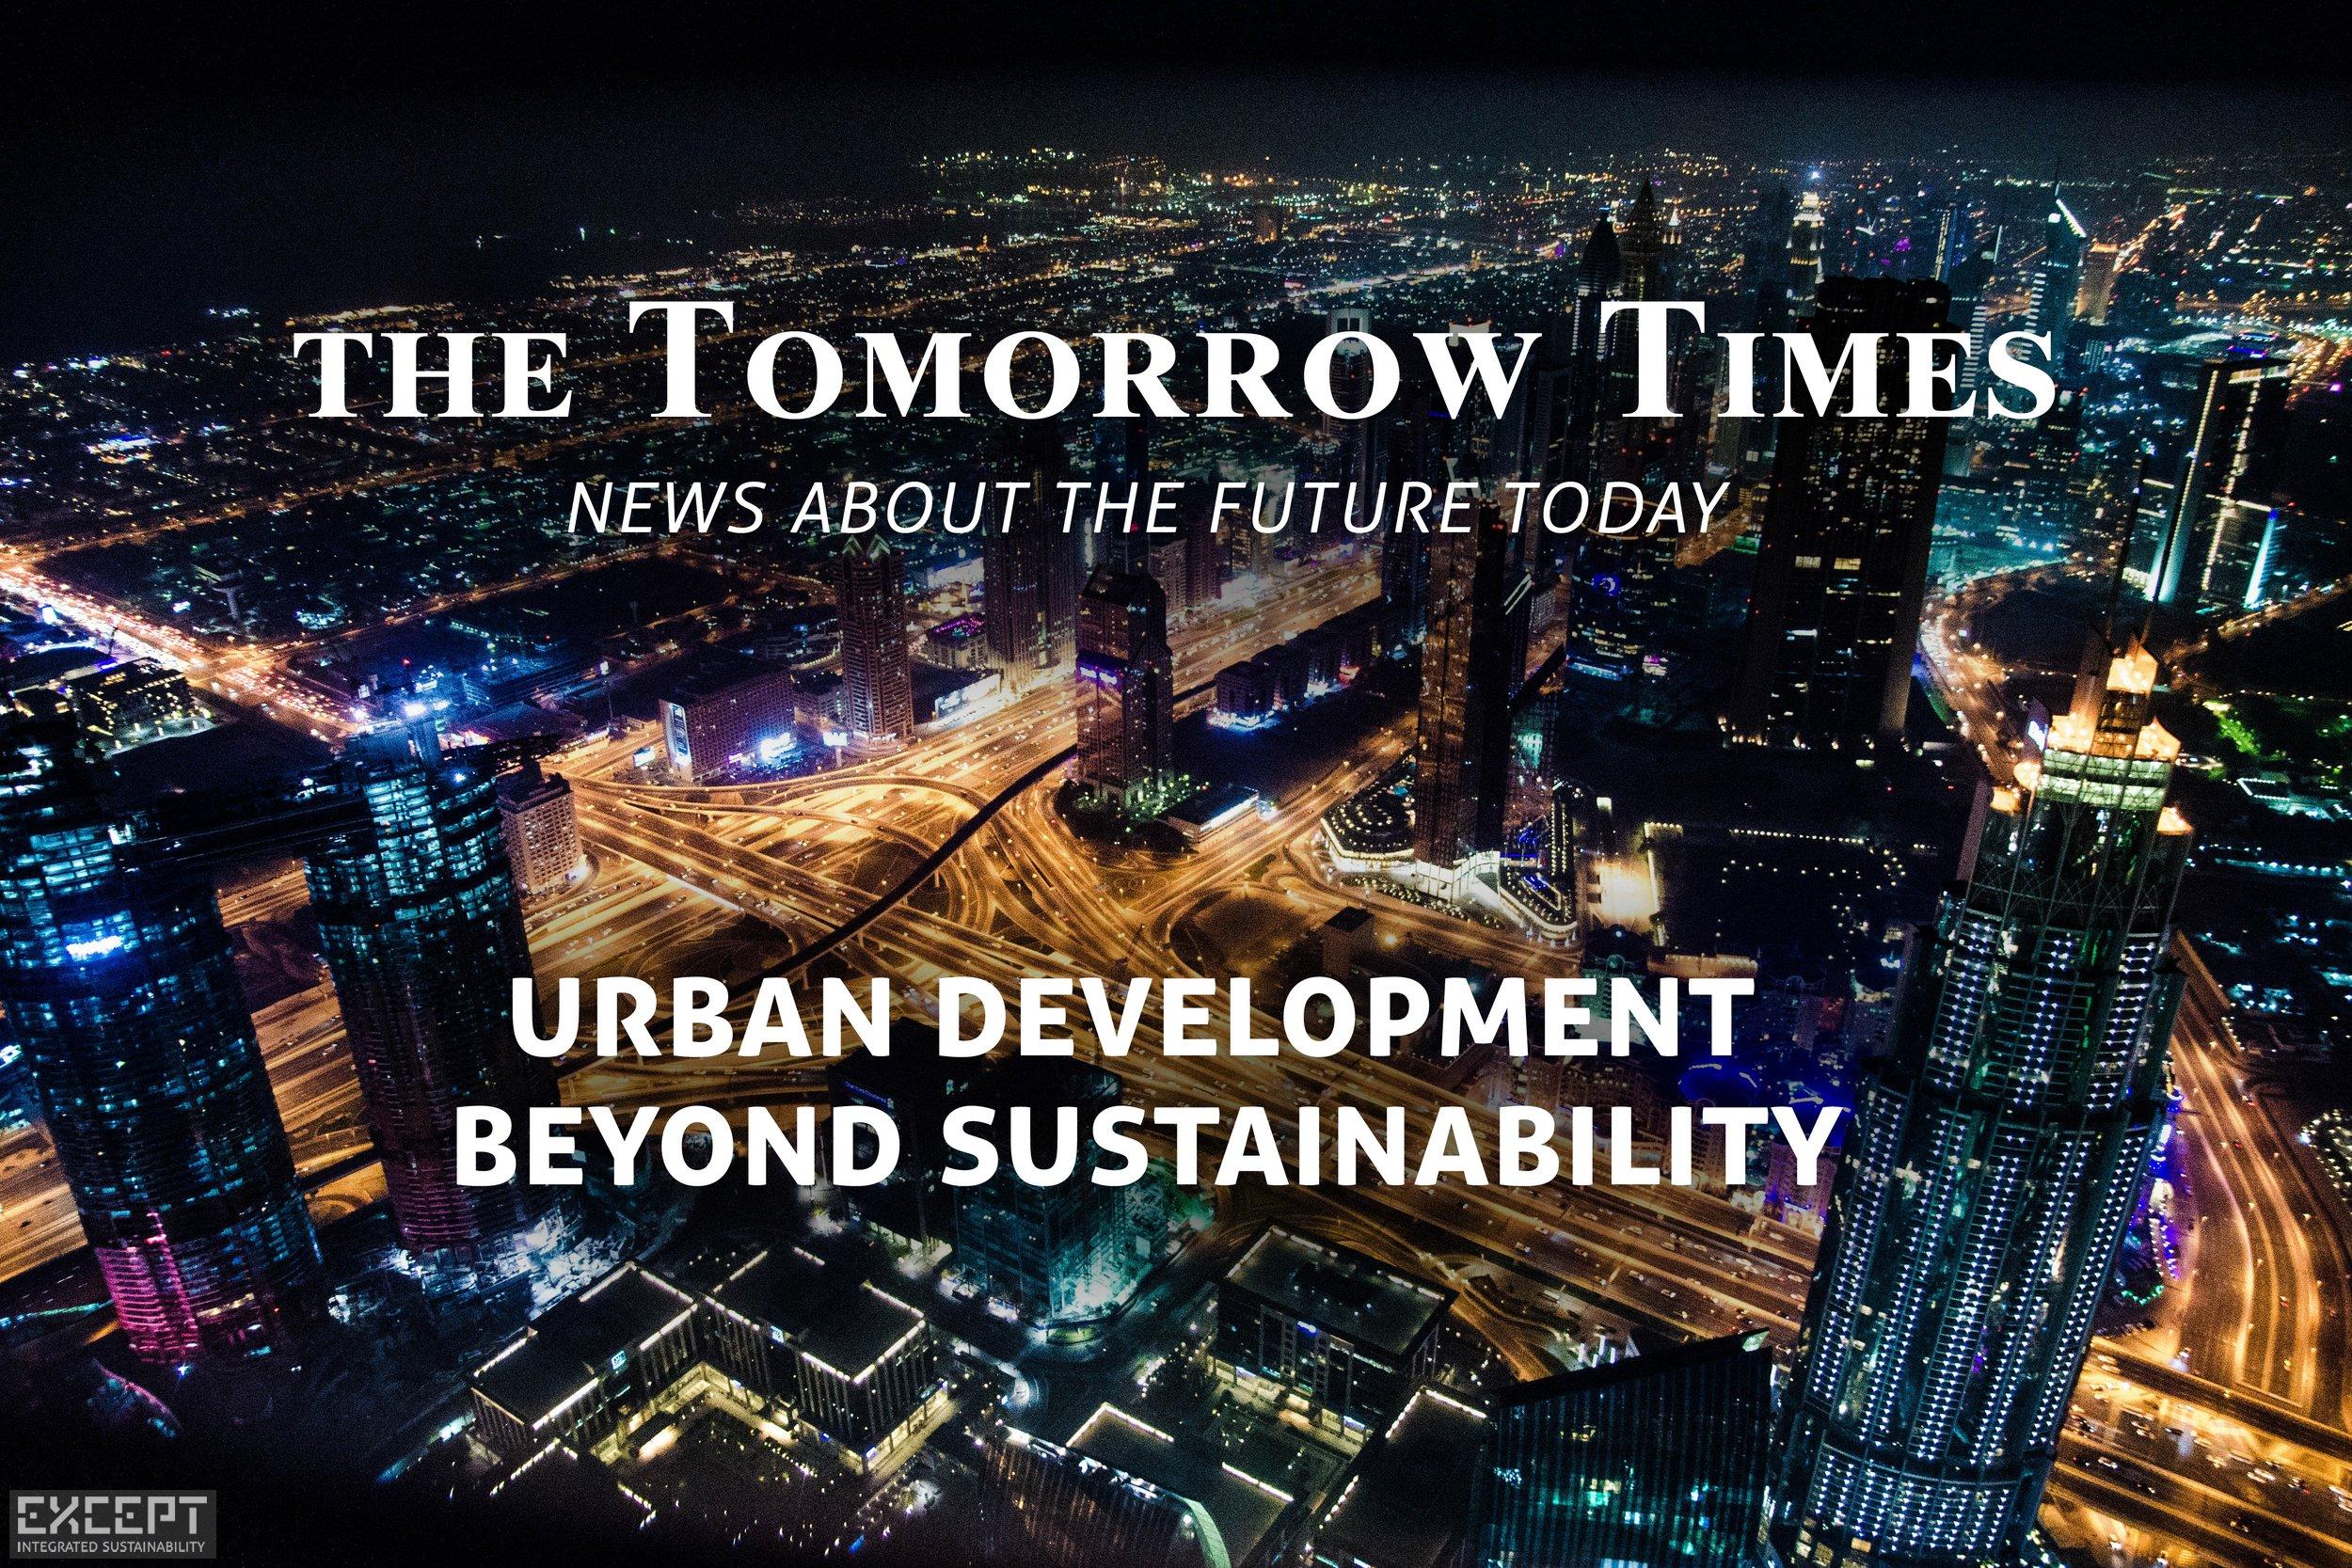 'The Tomorrow Times' - Jan '19: Urban Development - ASSET IMAGE -